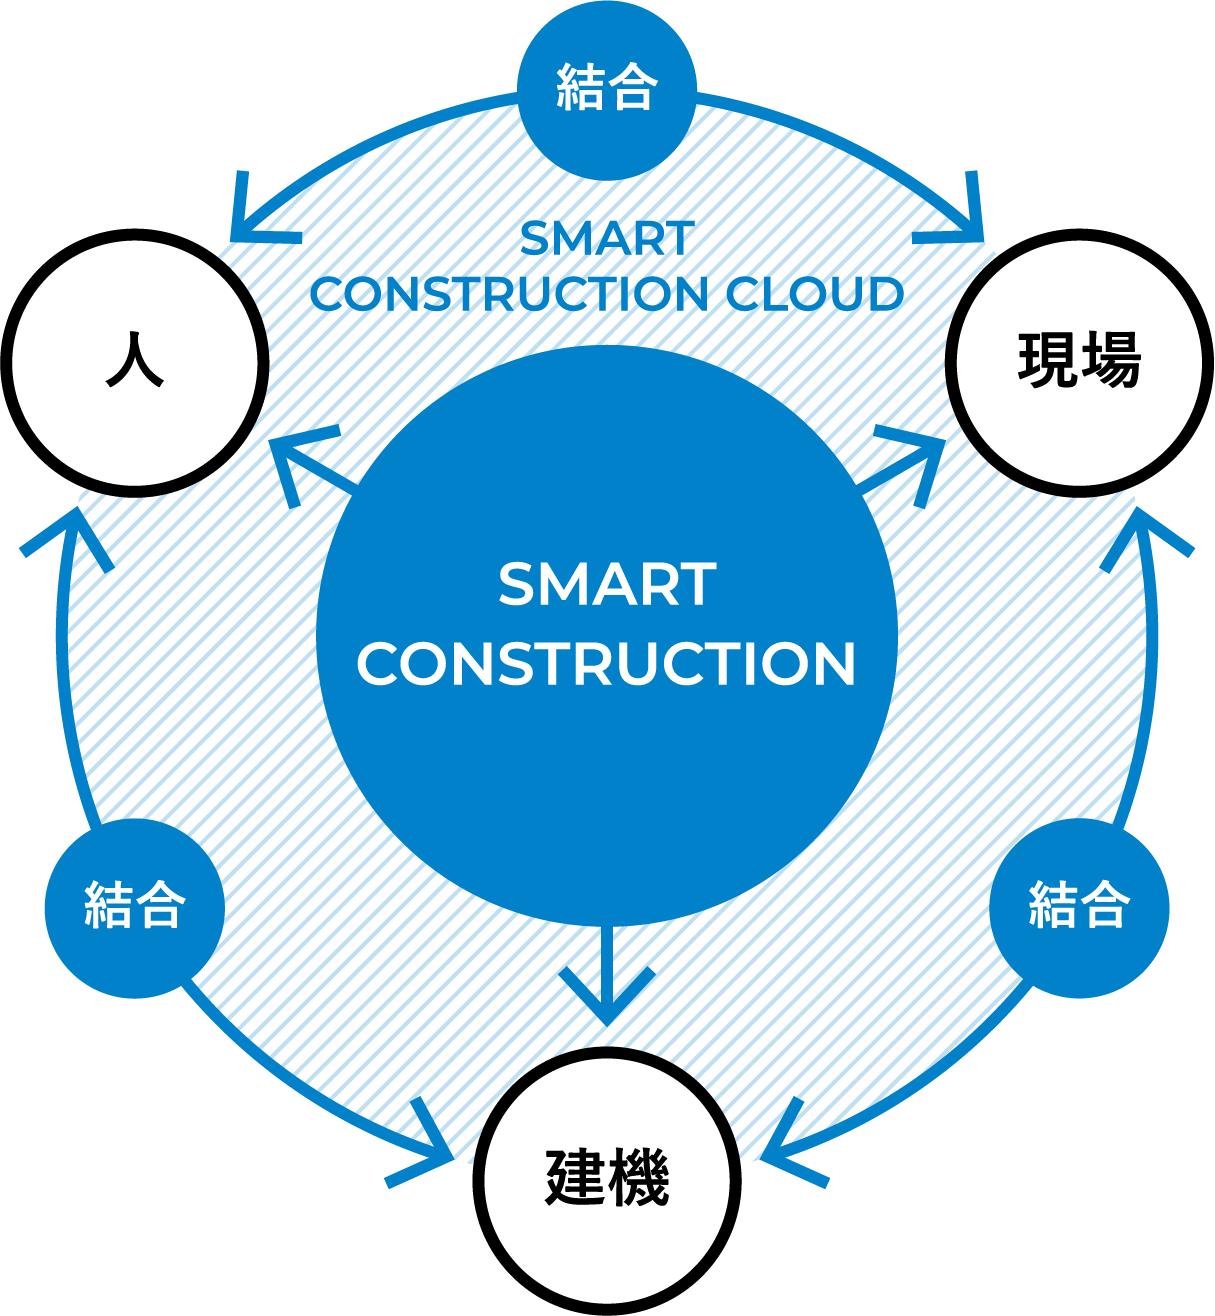 SMARTCONSTRUCTION